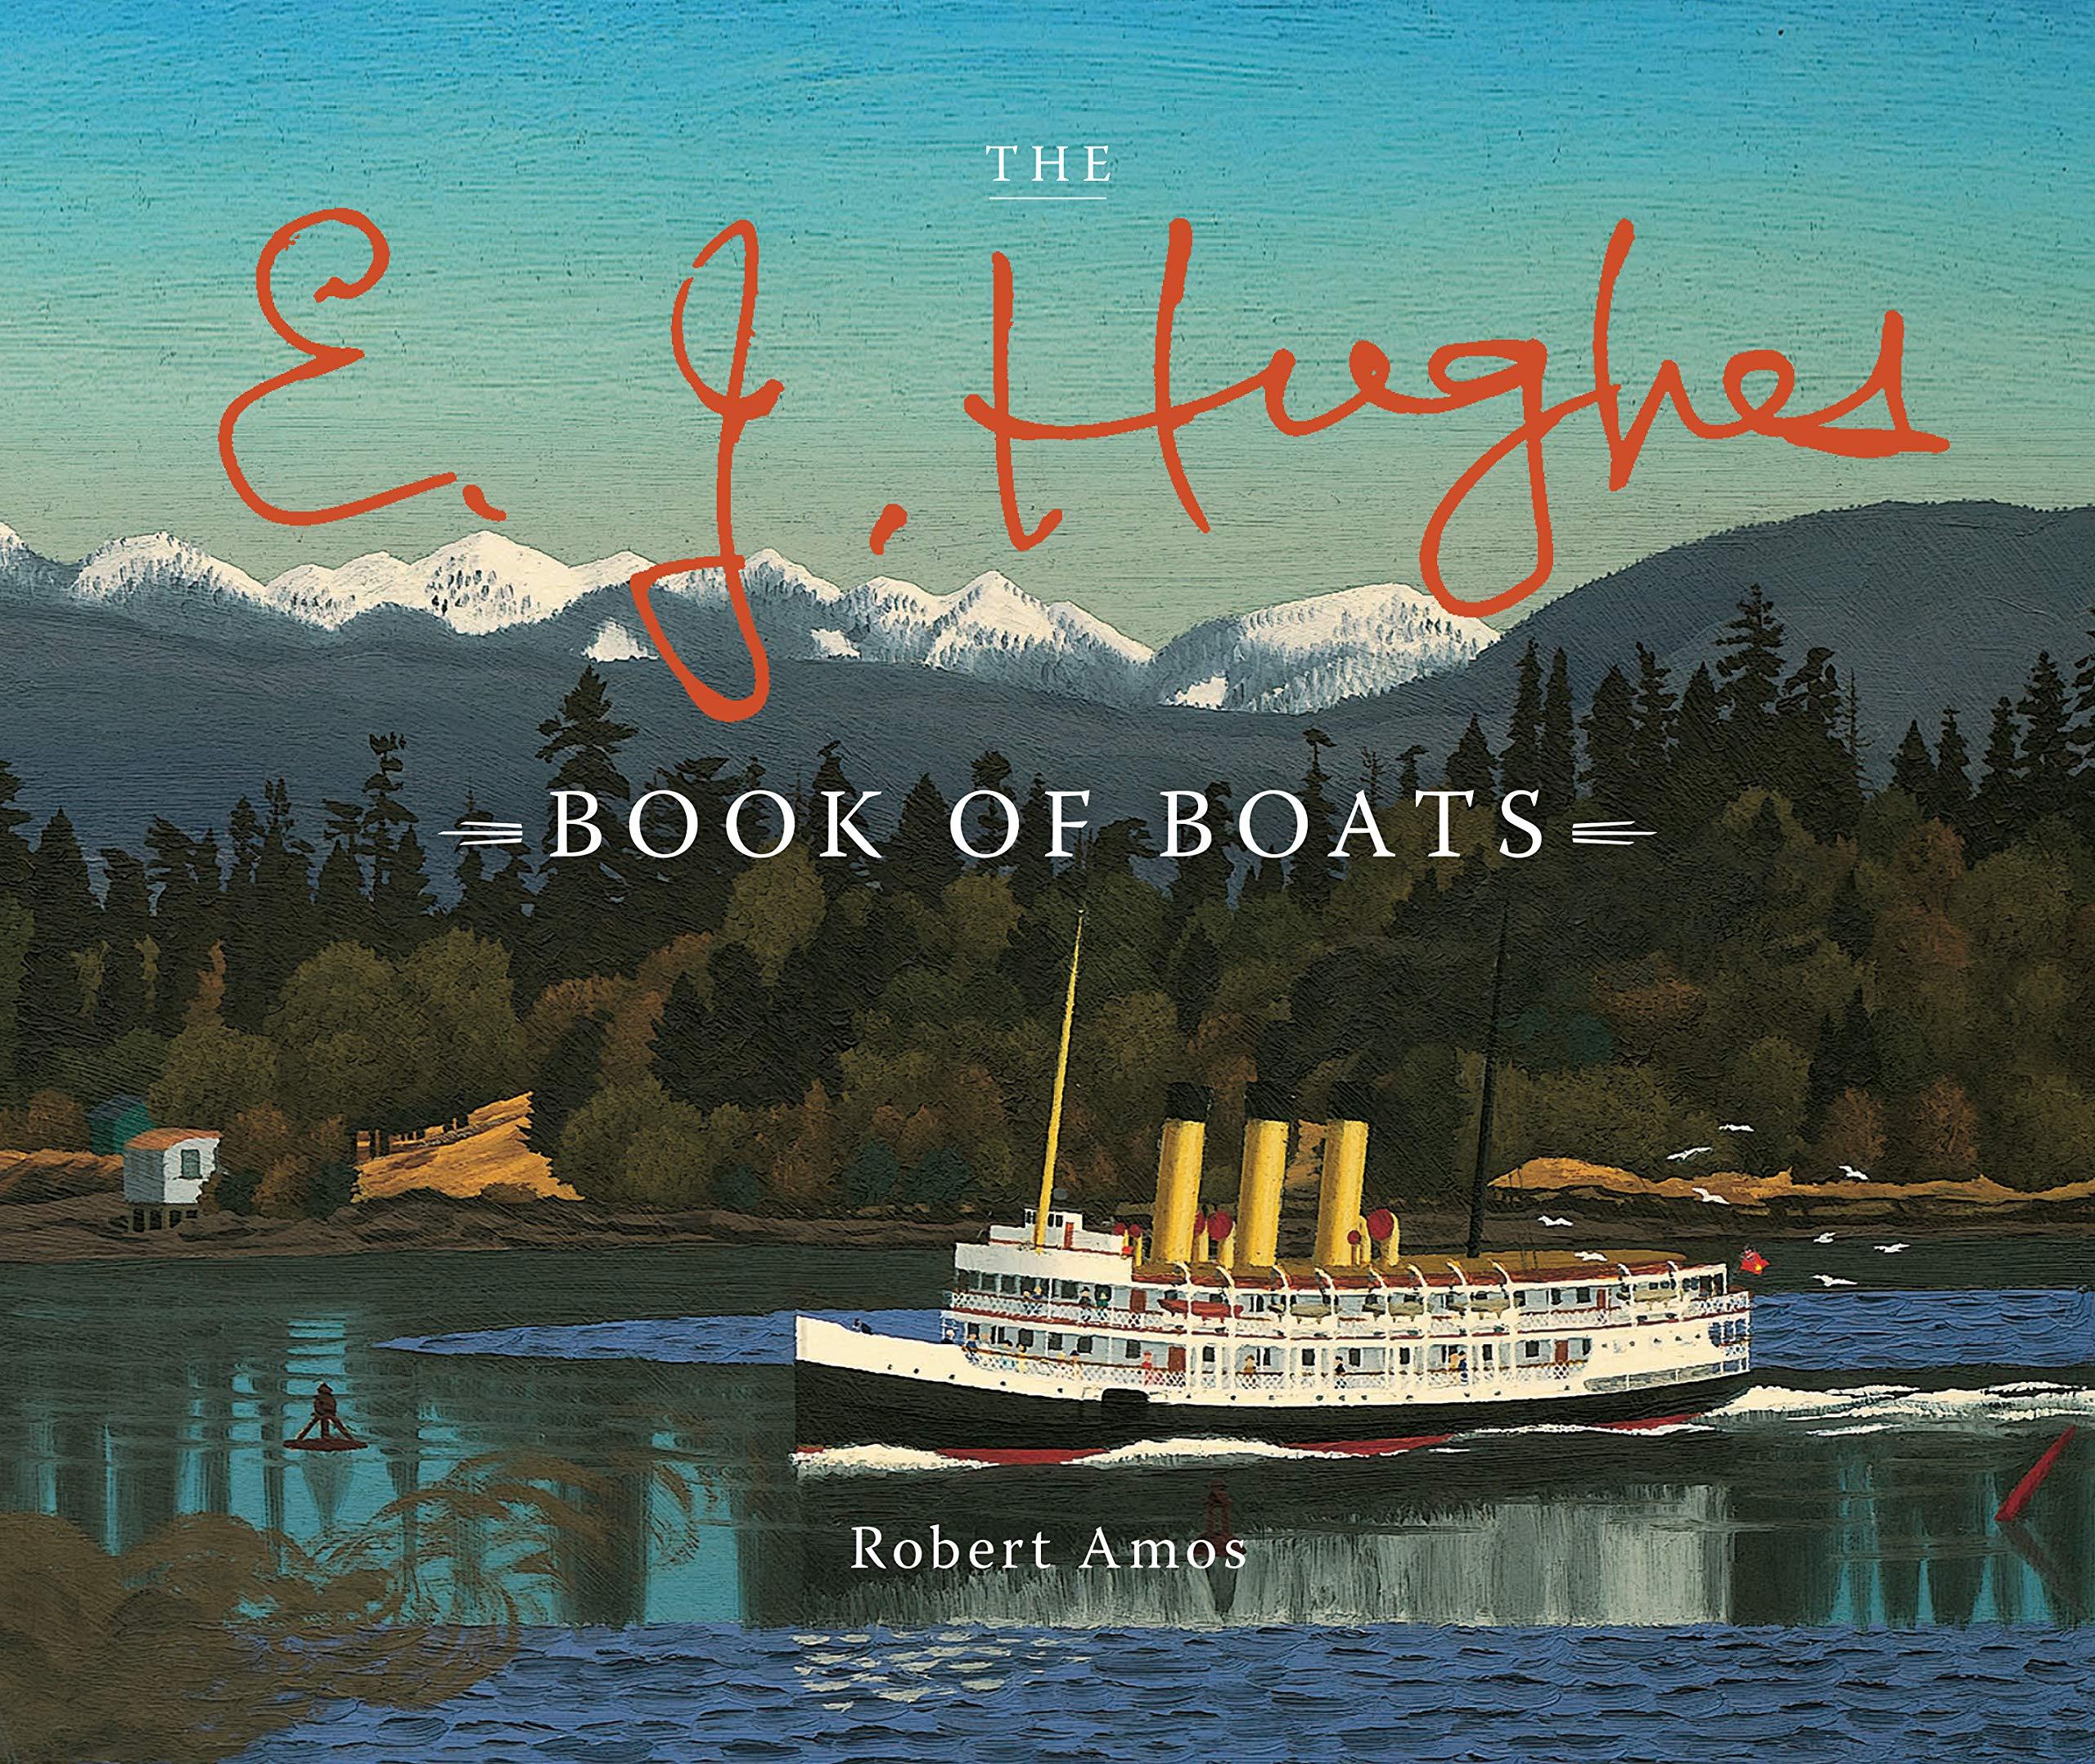 E.J. Hughes Book of Boats, The: Amos, Robert: 9781771513364: Books - Amazon .ca